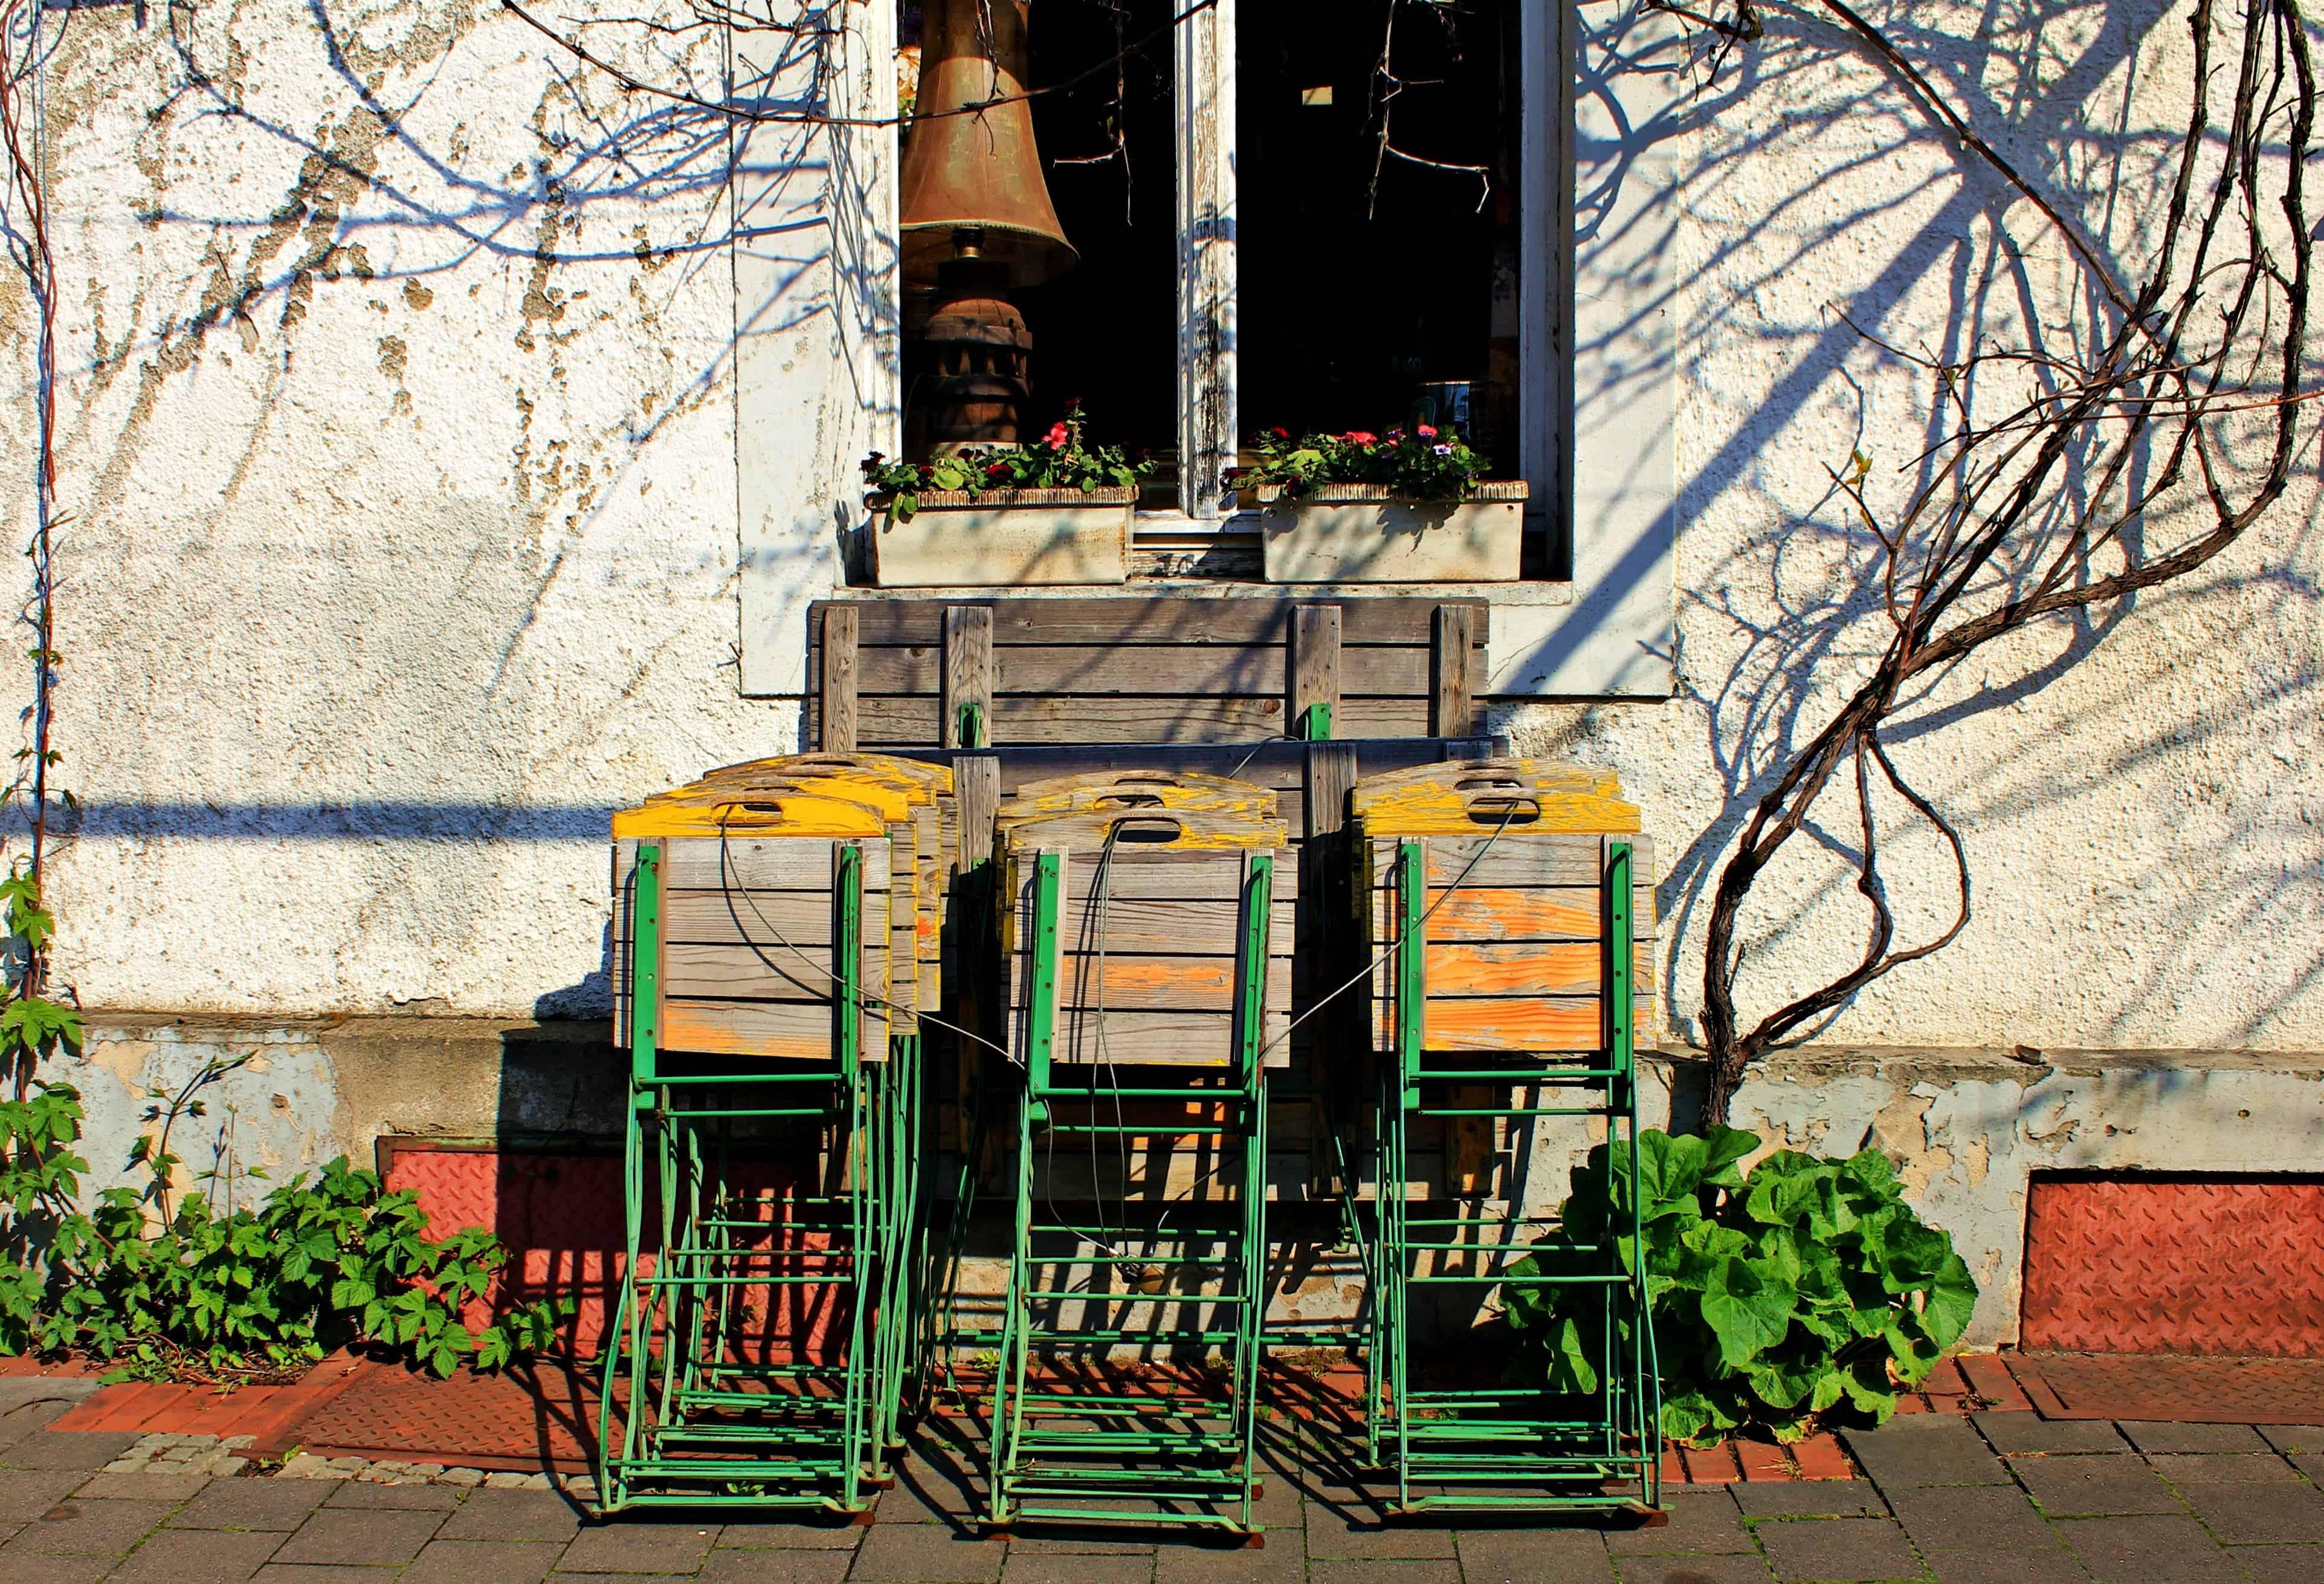 Imagen Gratis Silla De Madera Exterior Sombra Planta Exterior - Plantas-sombra-exterior